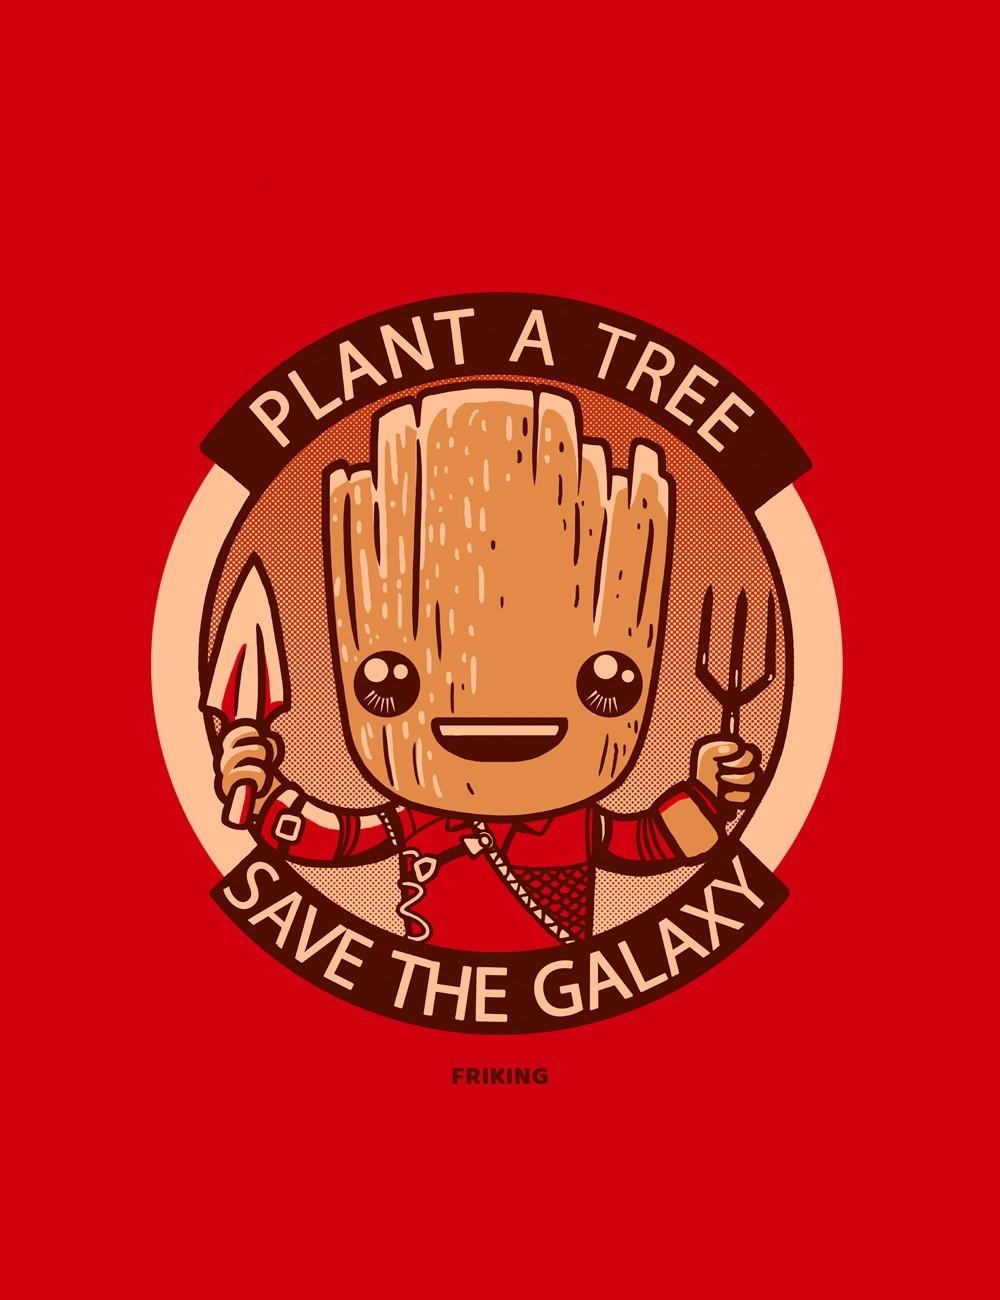 Save the galaxy